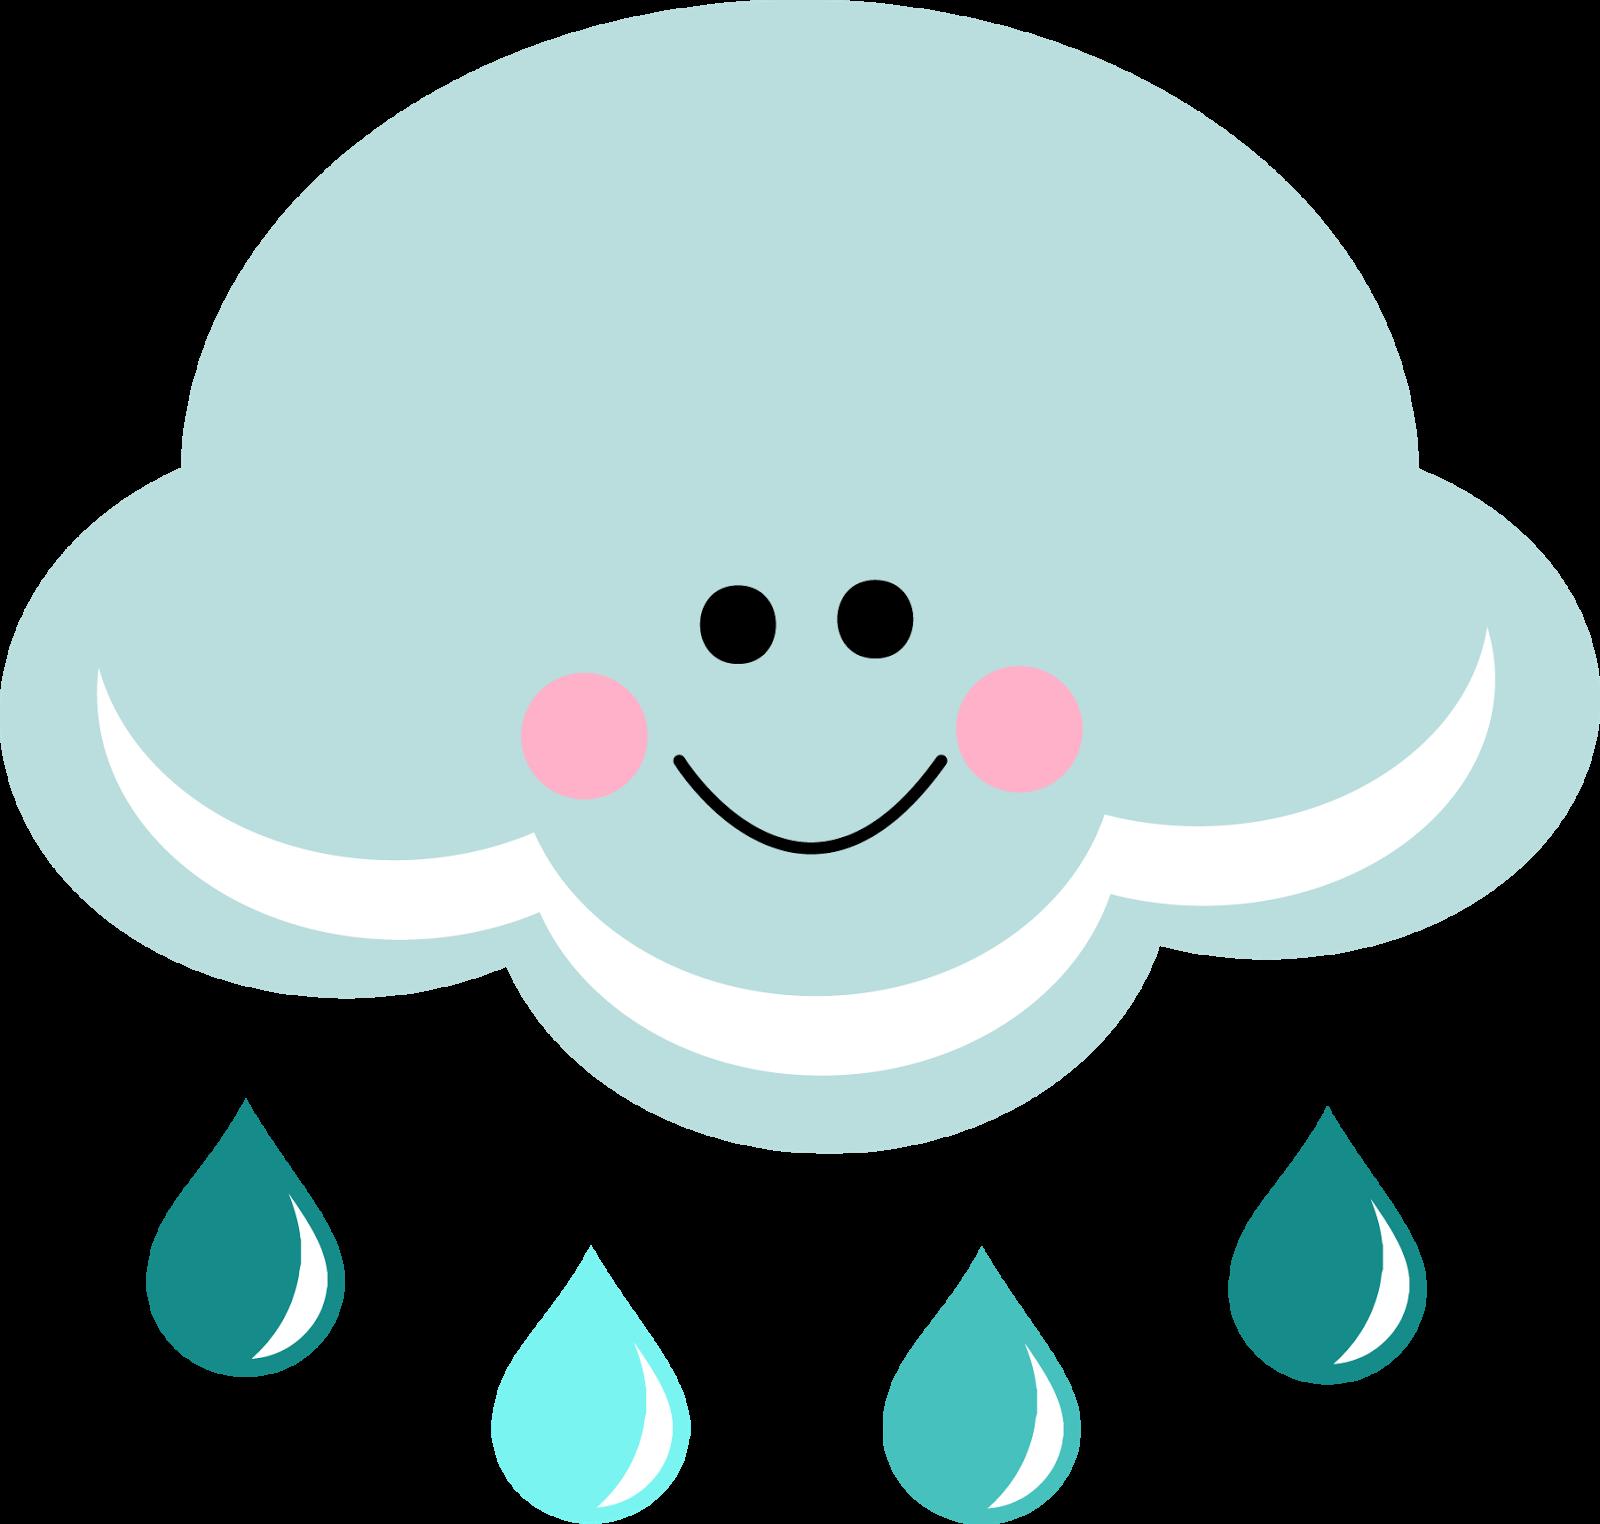 Rain Clouds Clipart - ClipArt Best